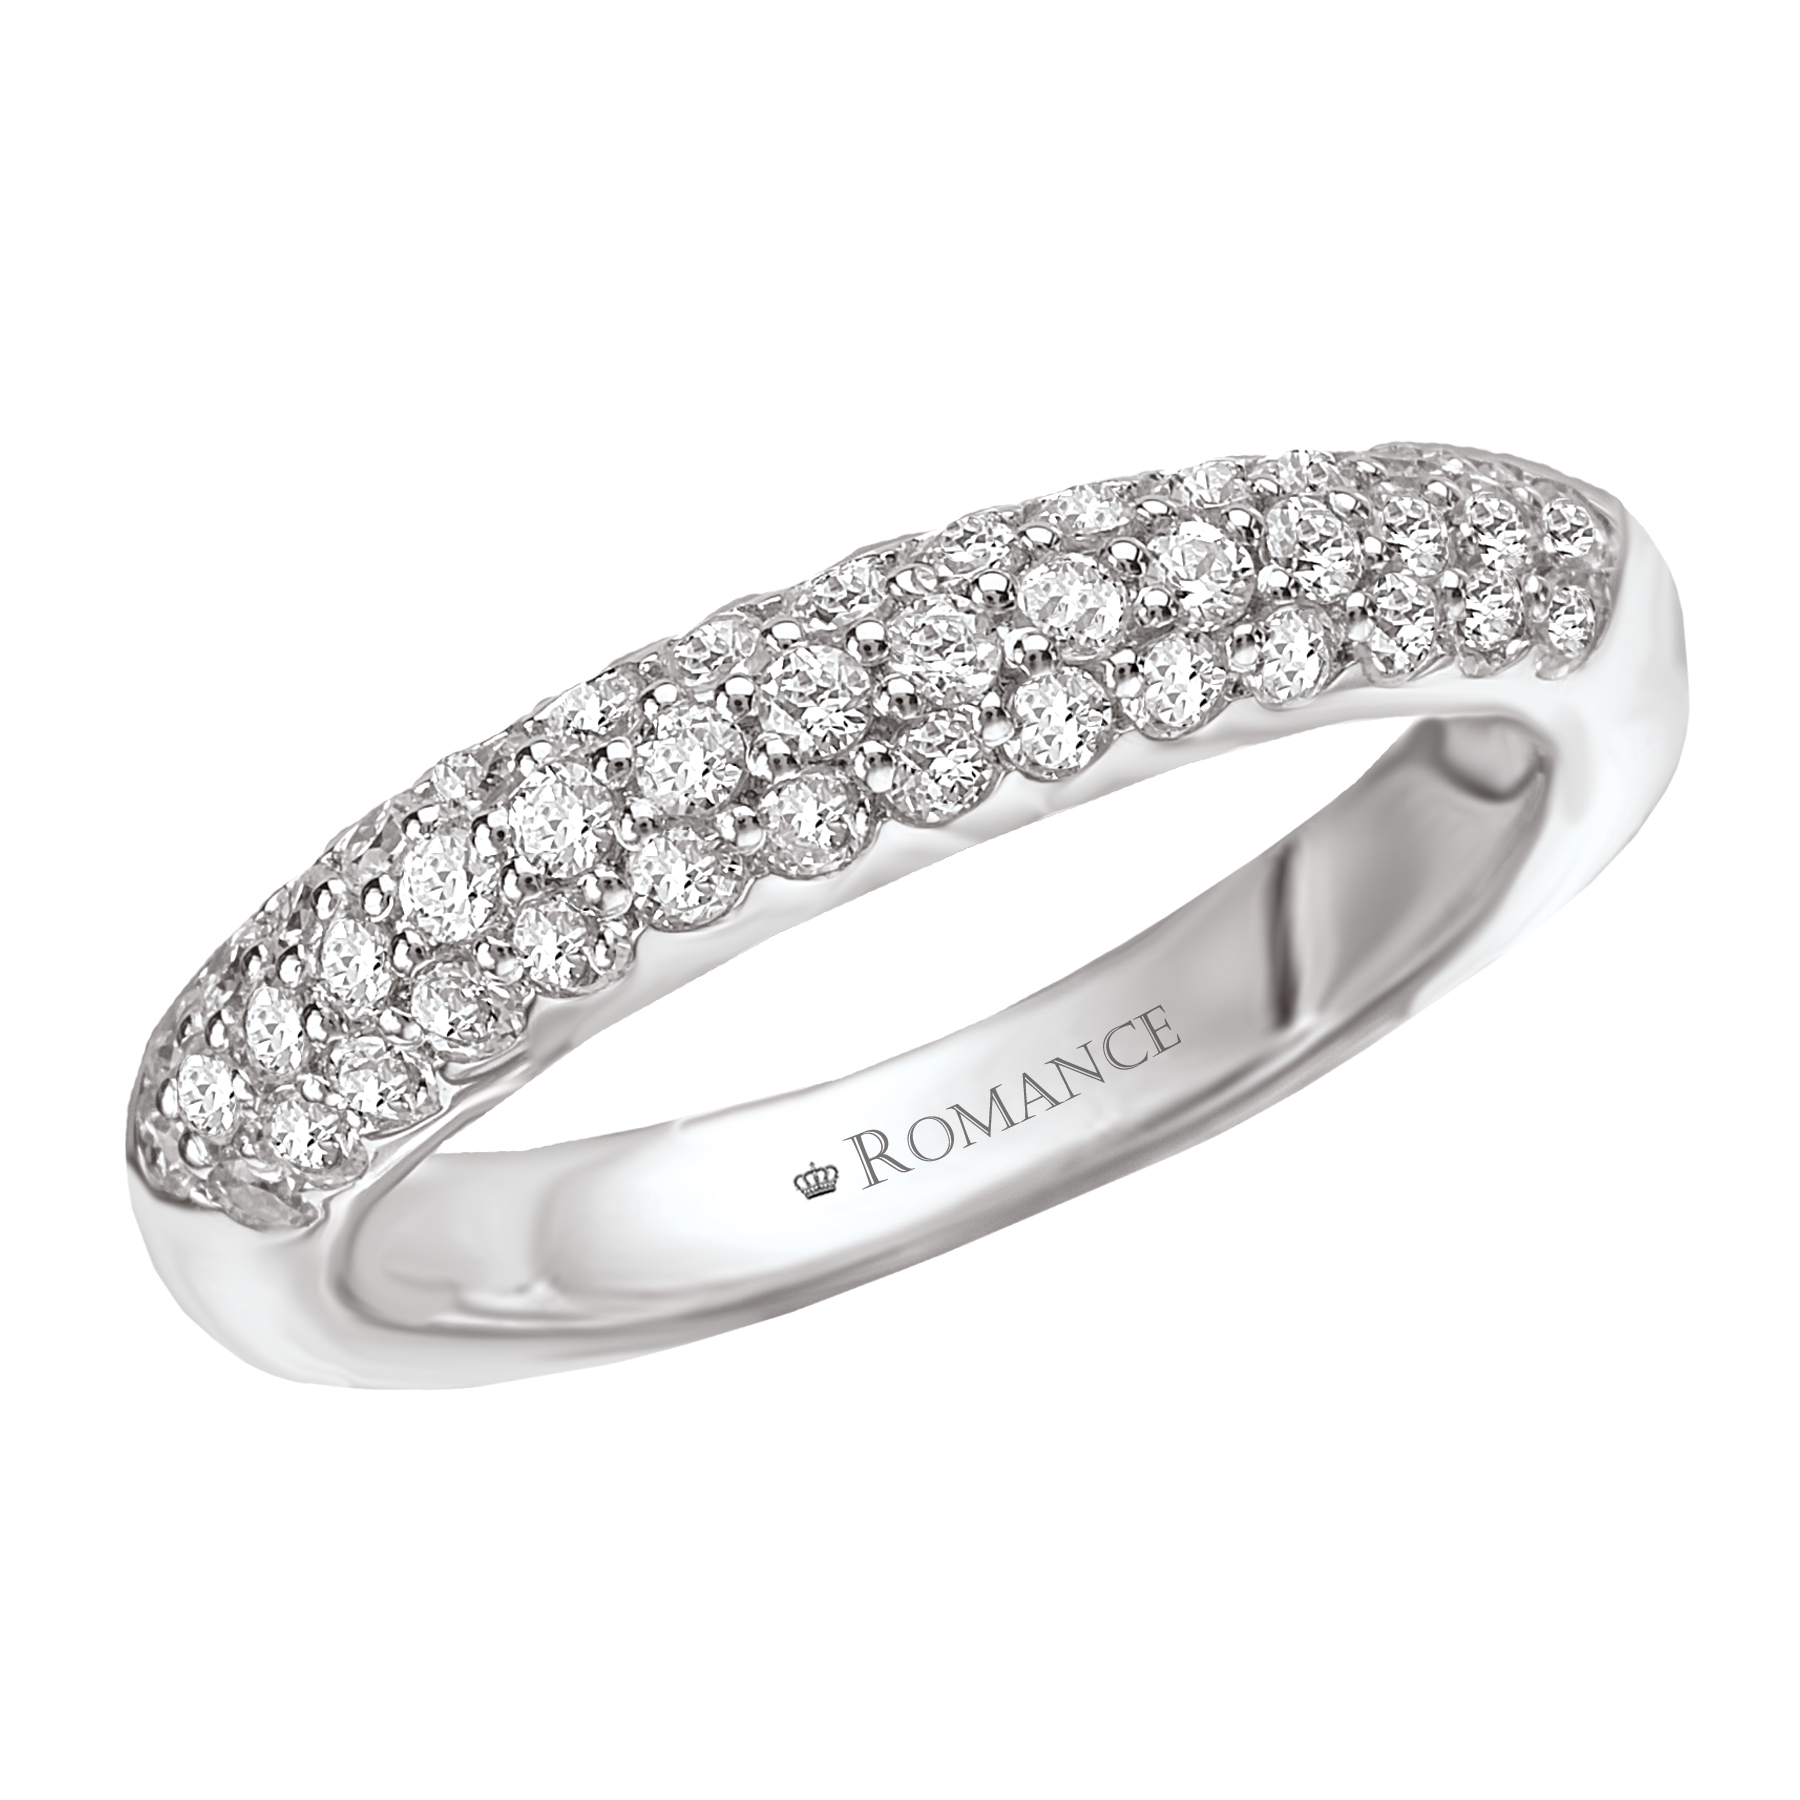 Romance Wedding Bands 117174-W product image